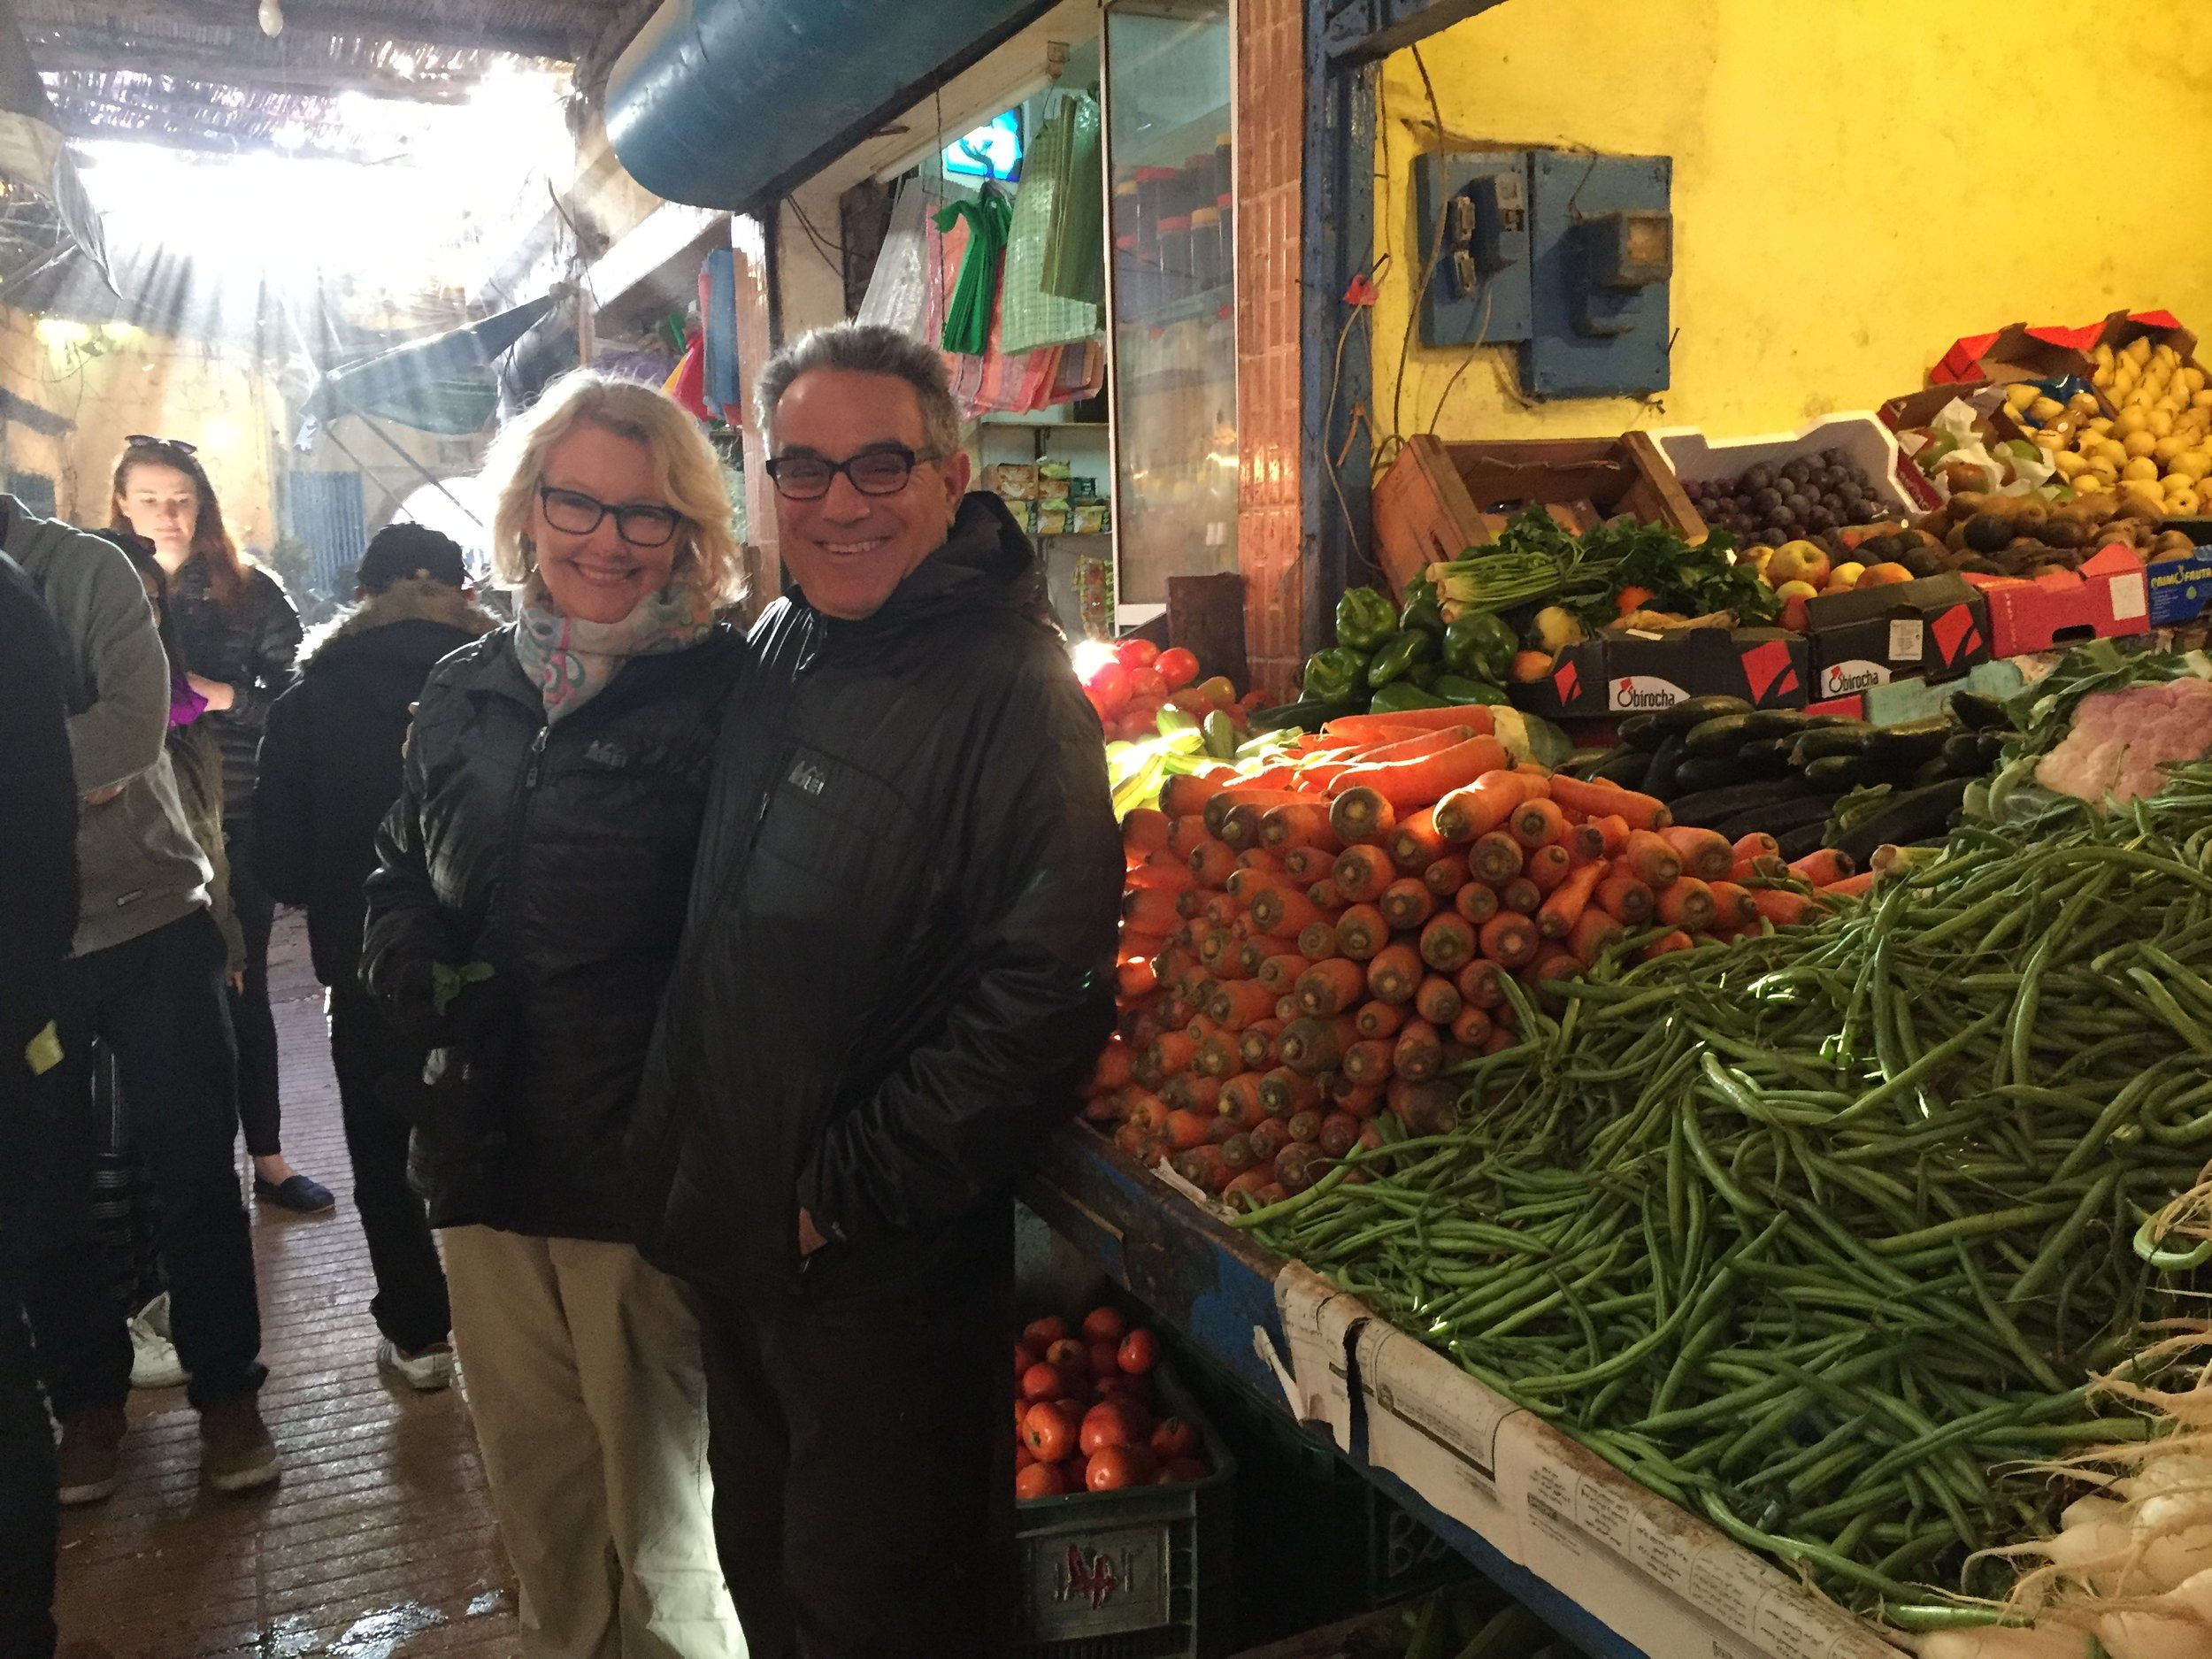 The market of Marrakech